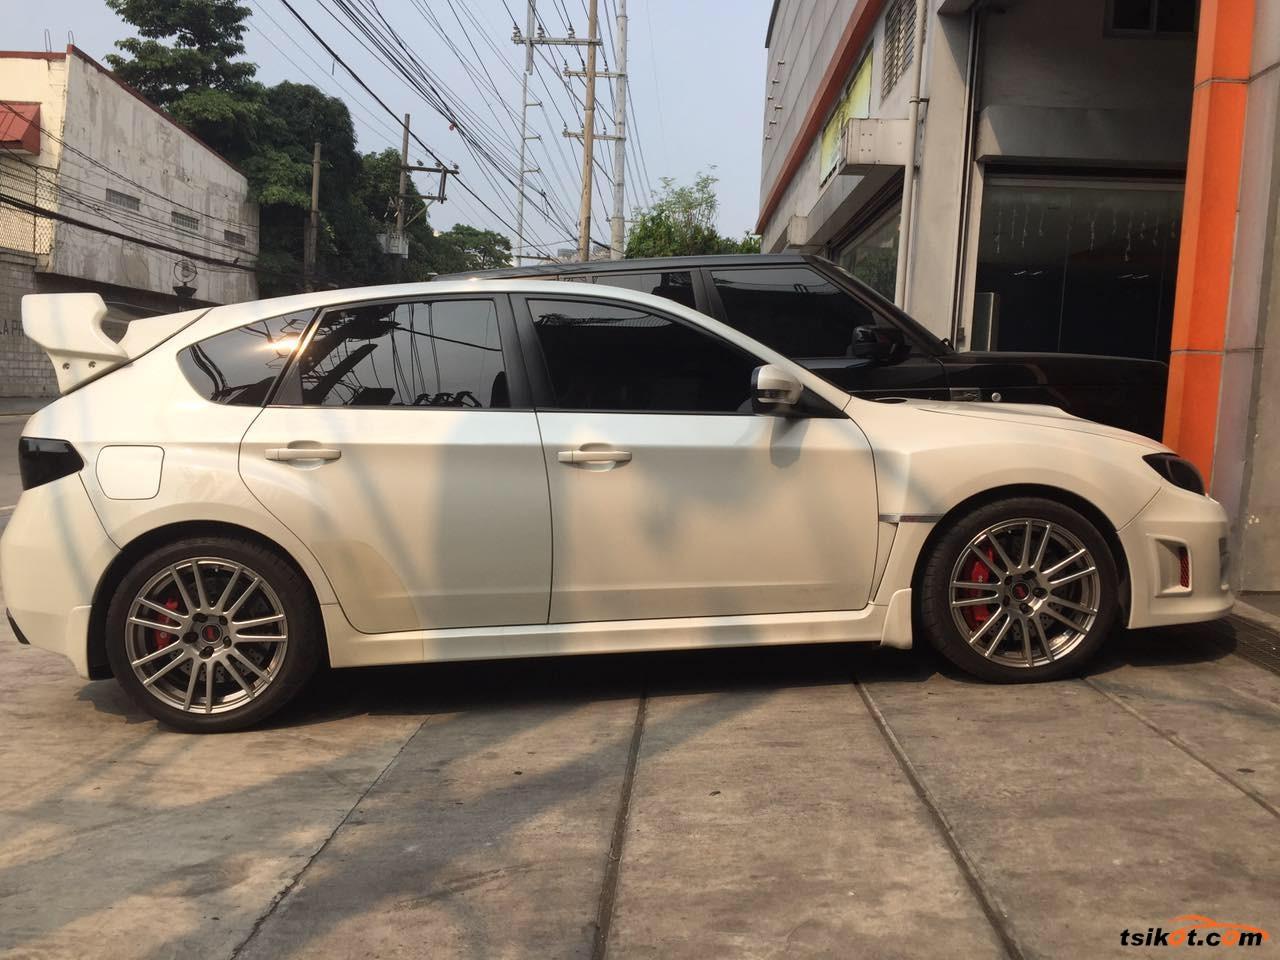 Subaru Impreza Wrx 2012 - 2